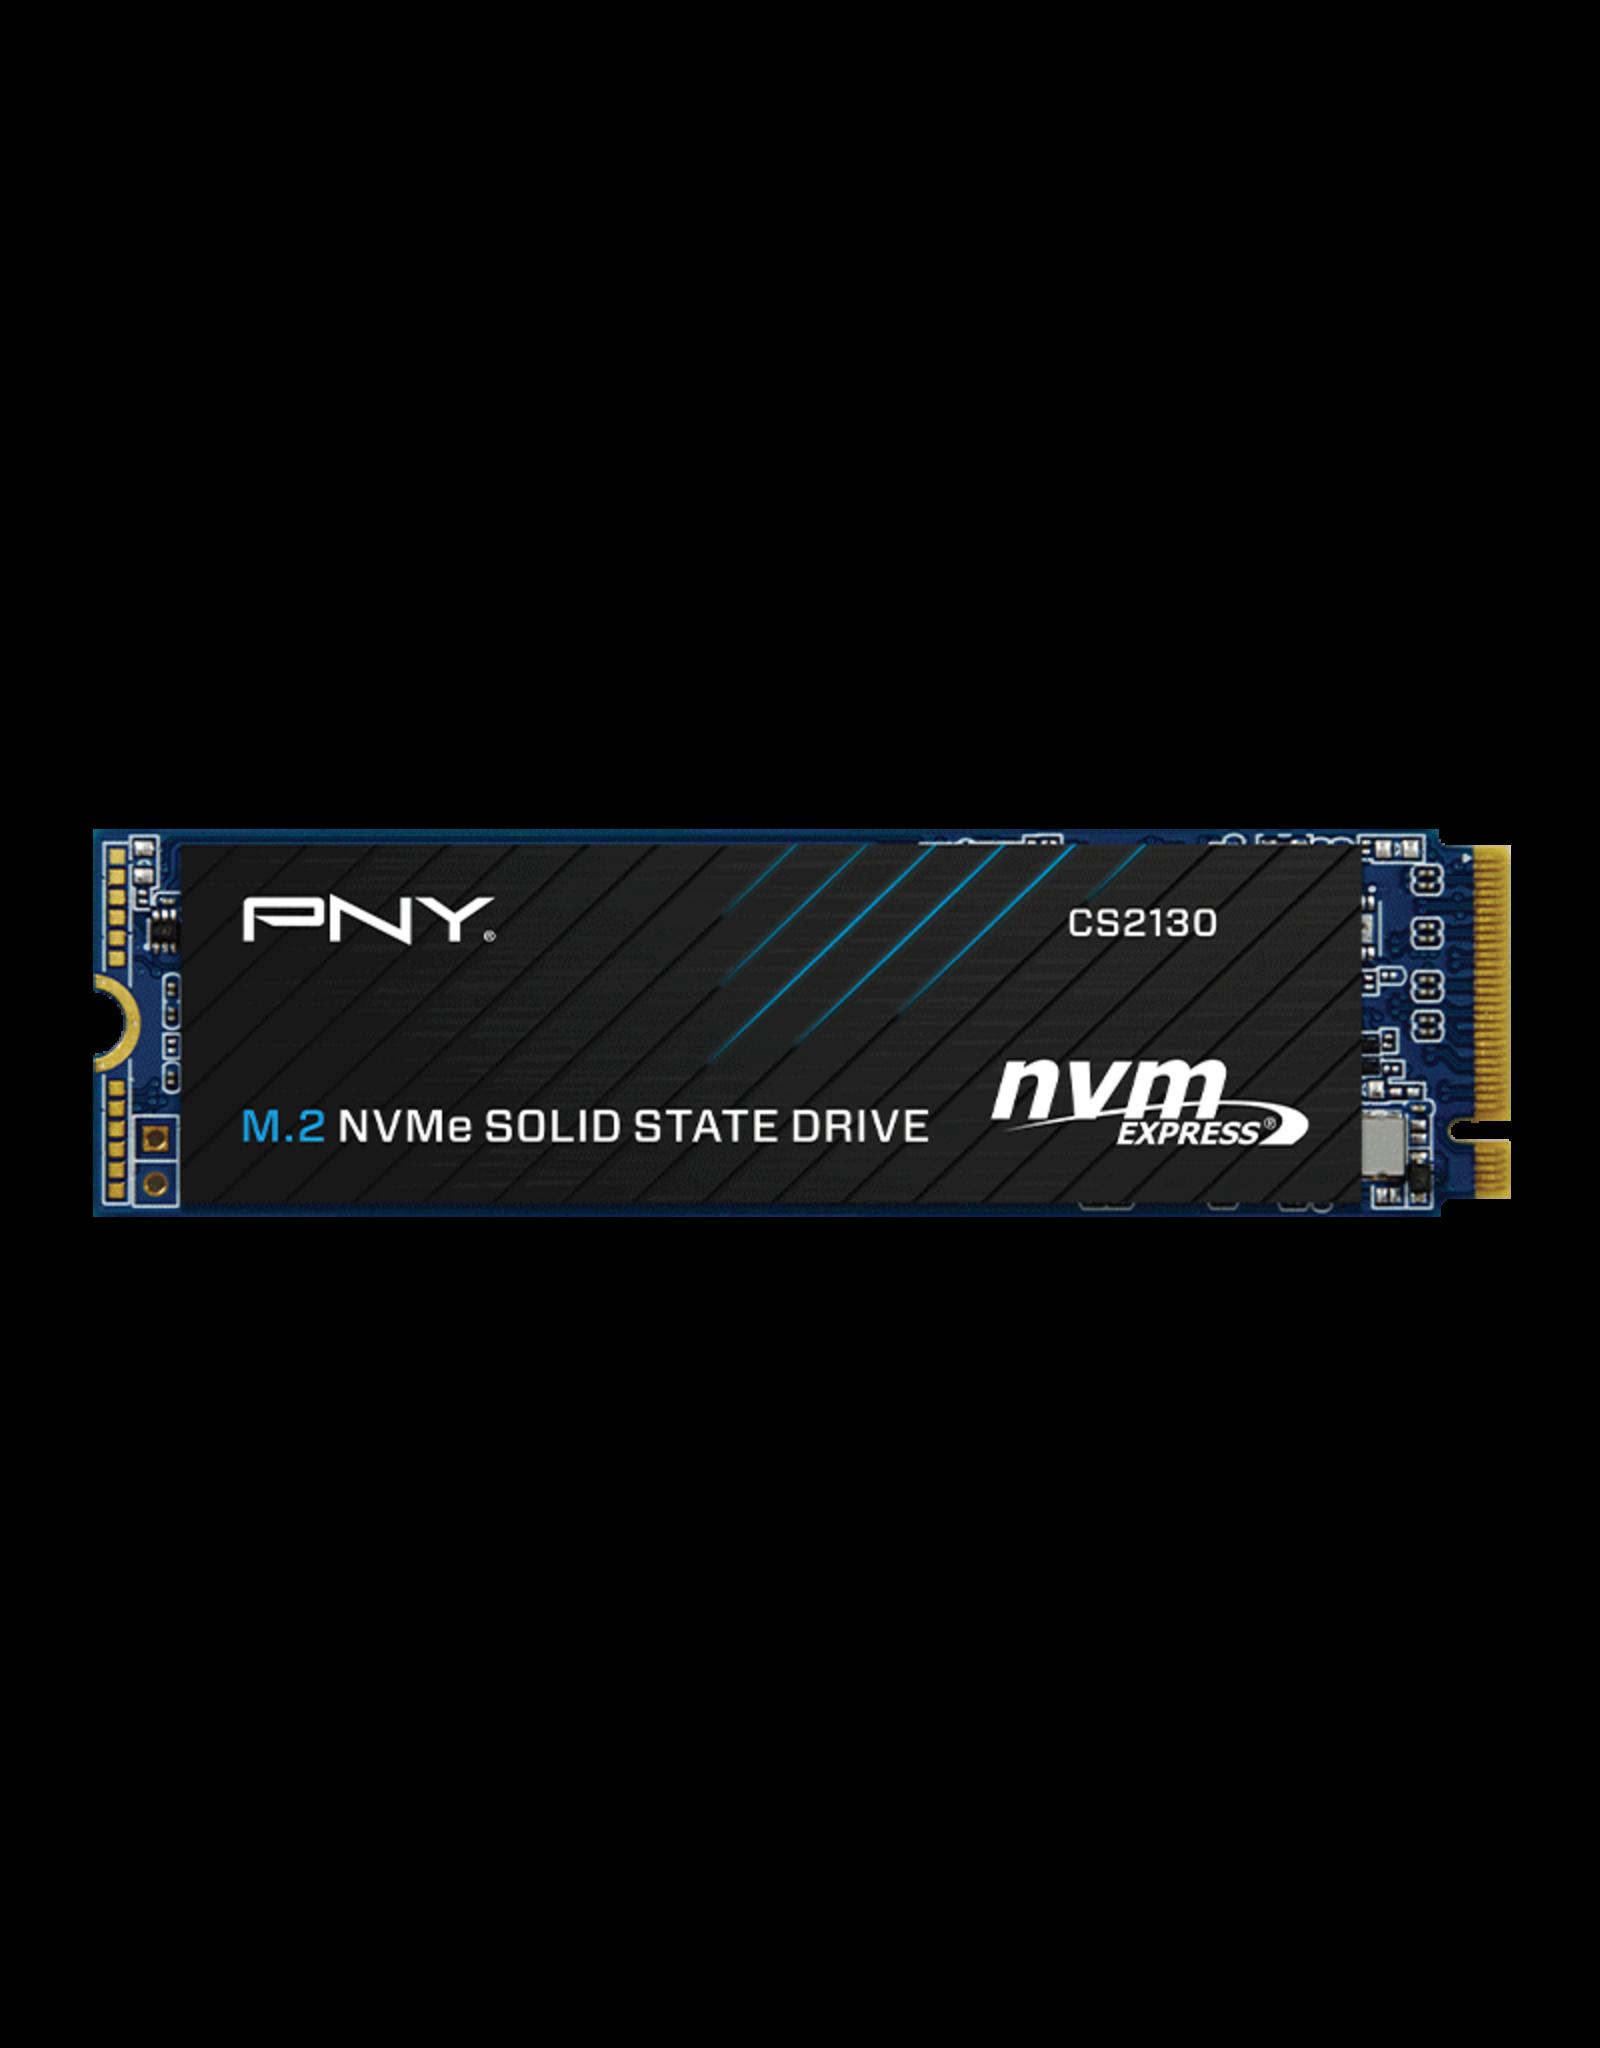 PNY PNY CS2130 1TB M.2 NVMe Gen 3x4 SSD